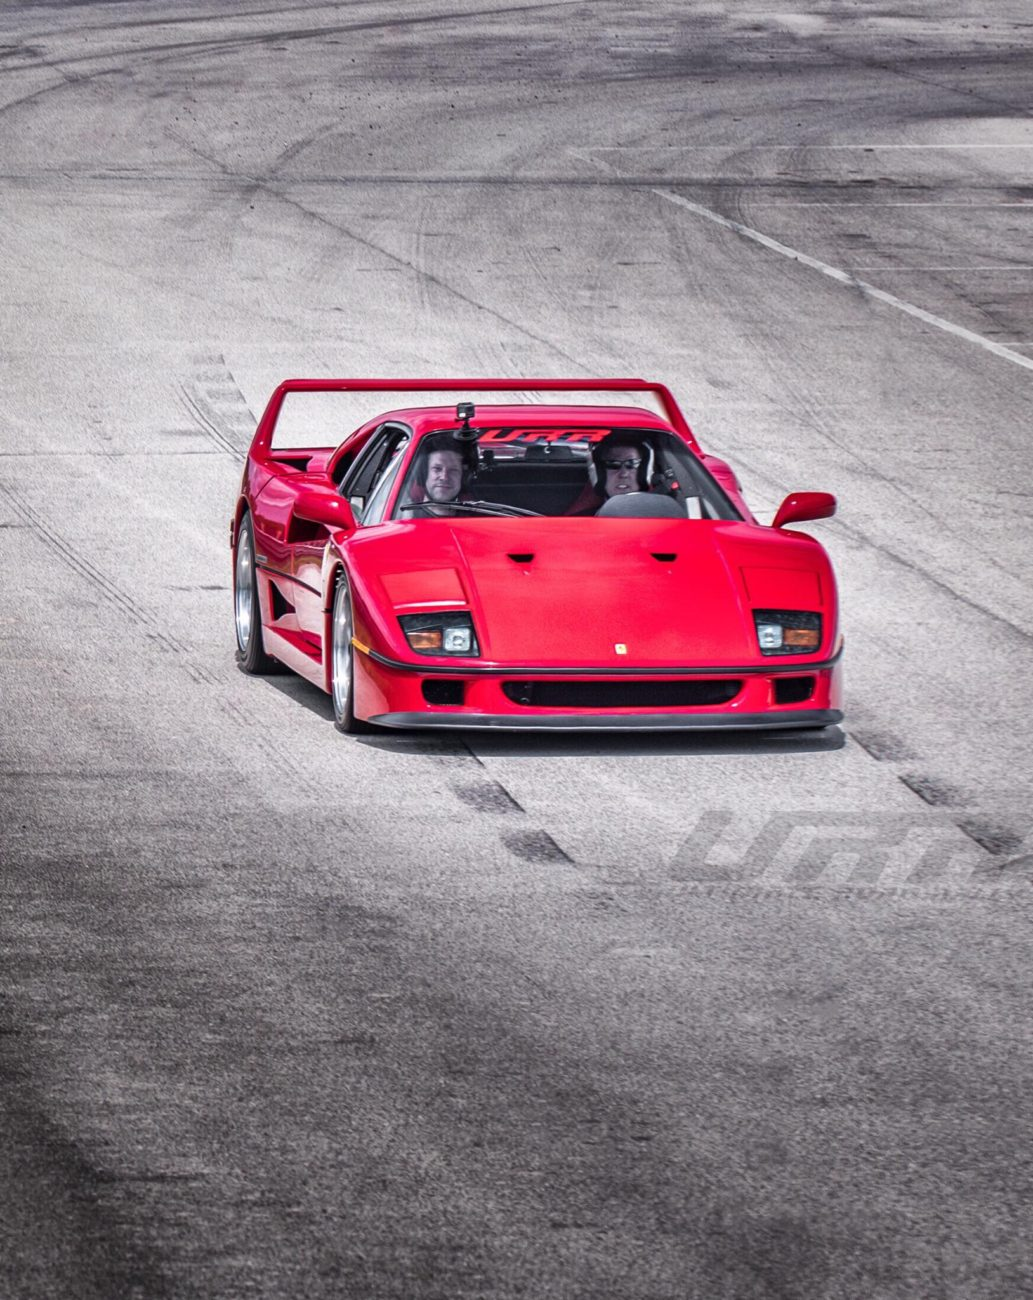 Arne's Antics Ferrari F40 Ultimate Road Rally Track Day CarBQ